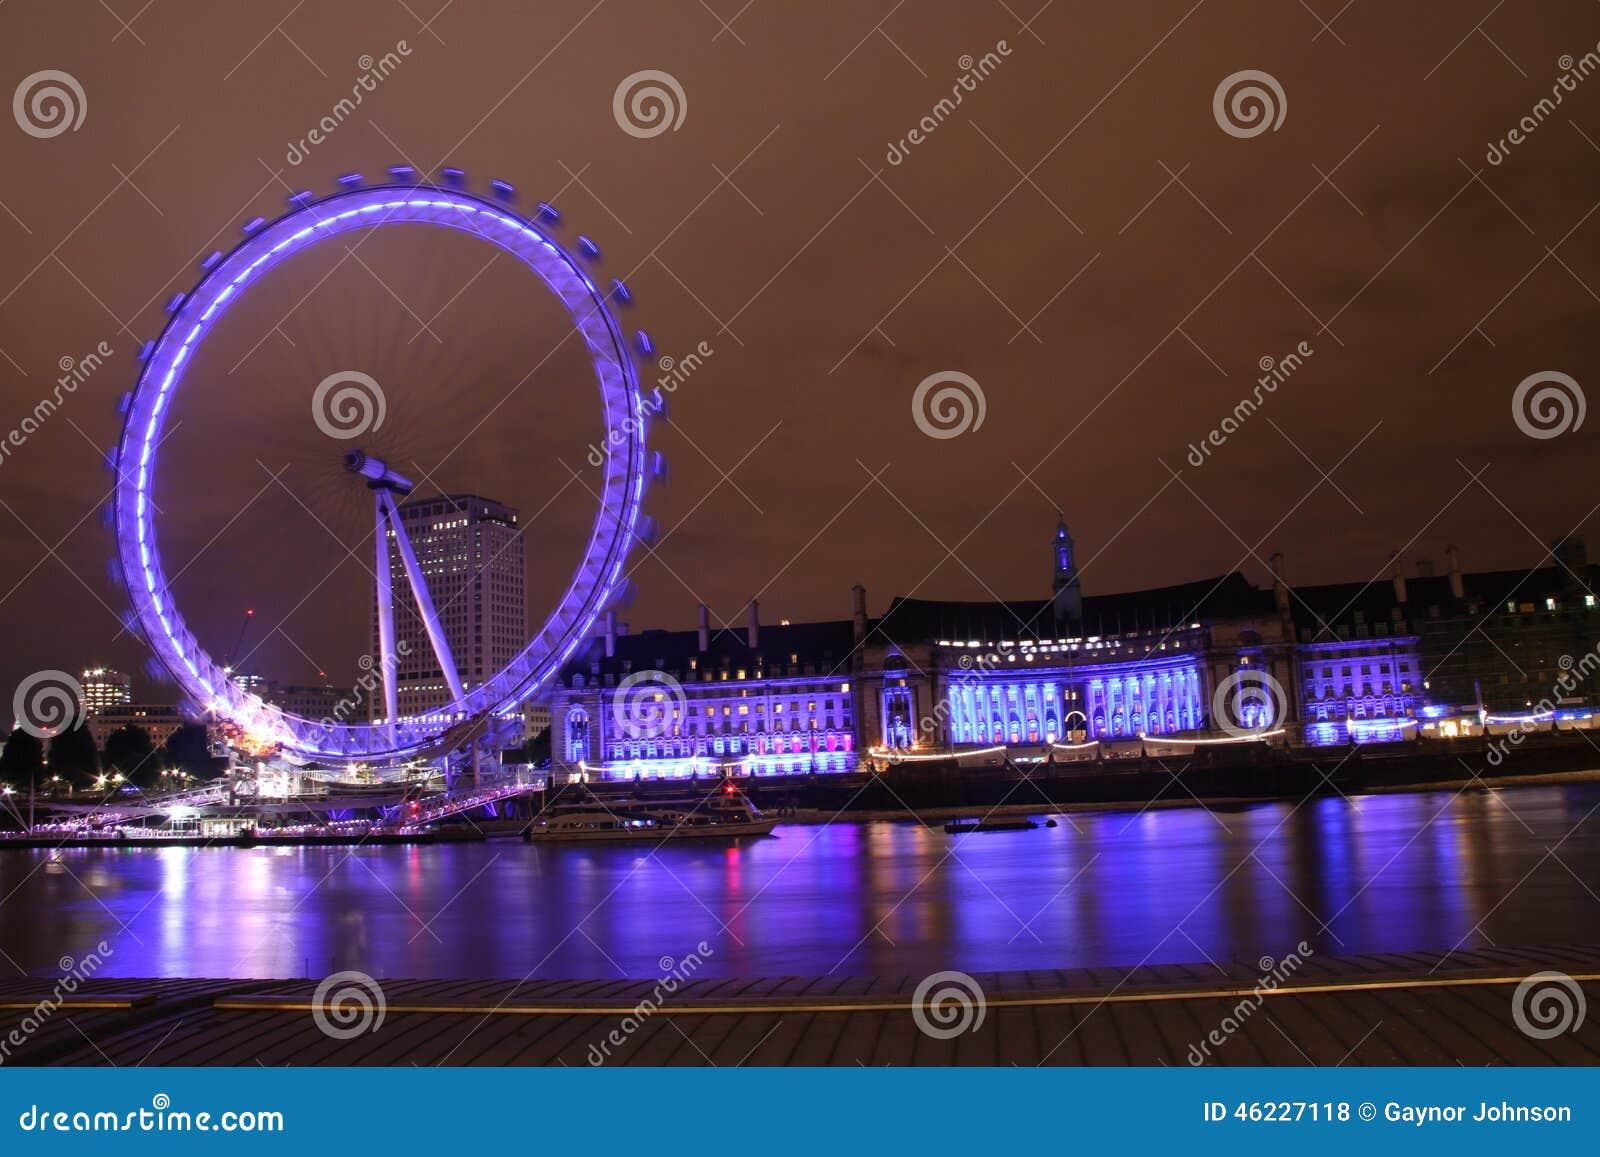 The London Eye and Southbank at night